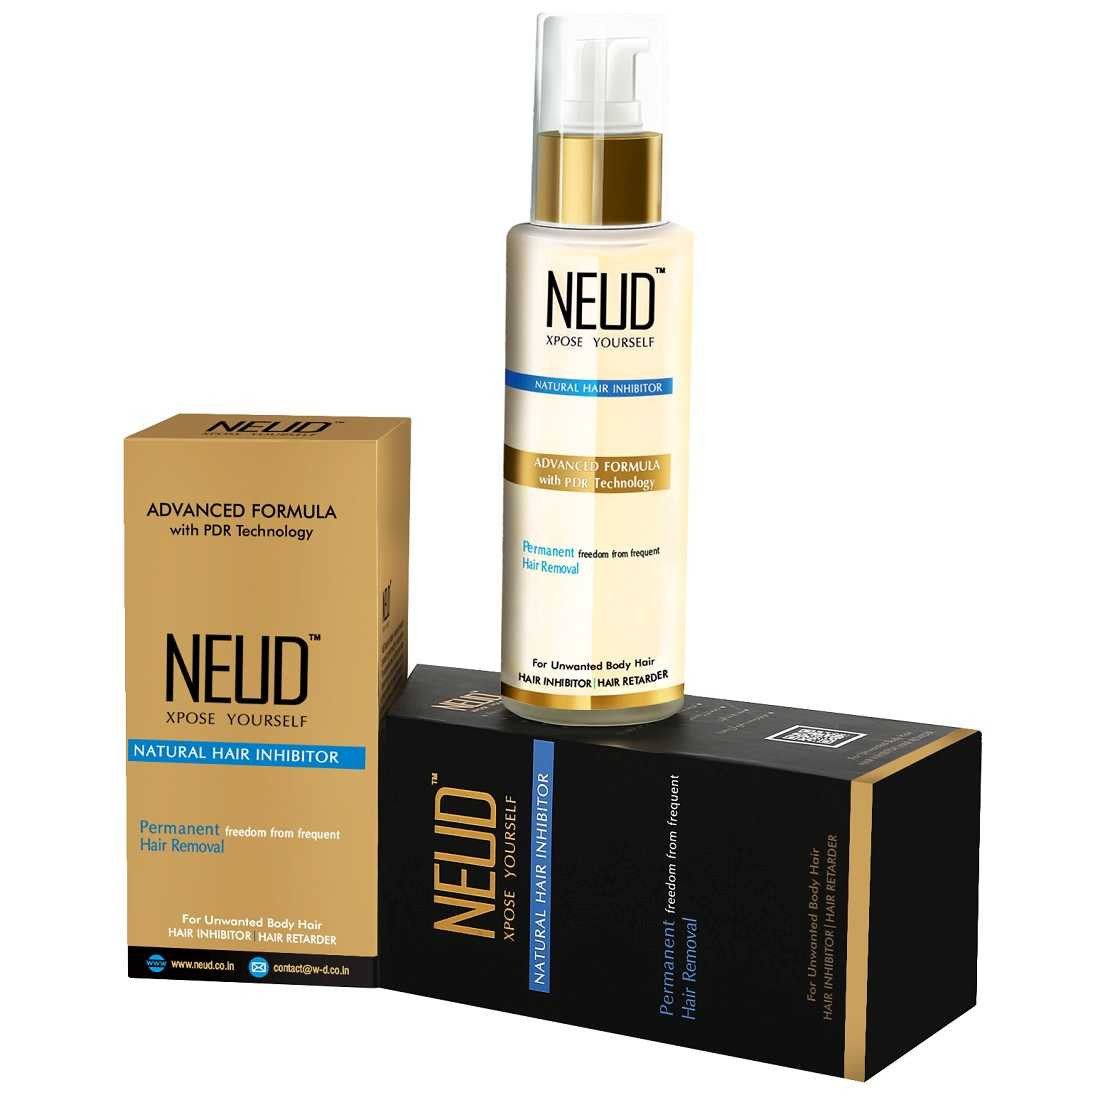 NEUD Natural Hair Inhibitor for Men & Women – 1 Pack (80g)